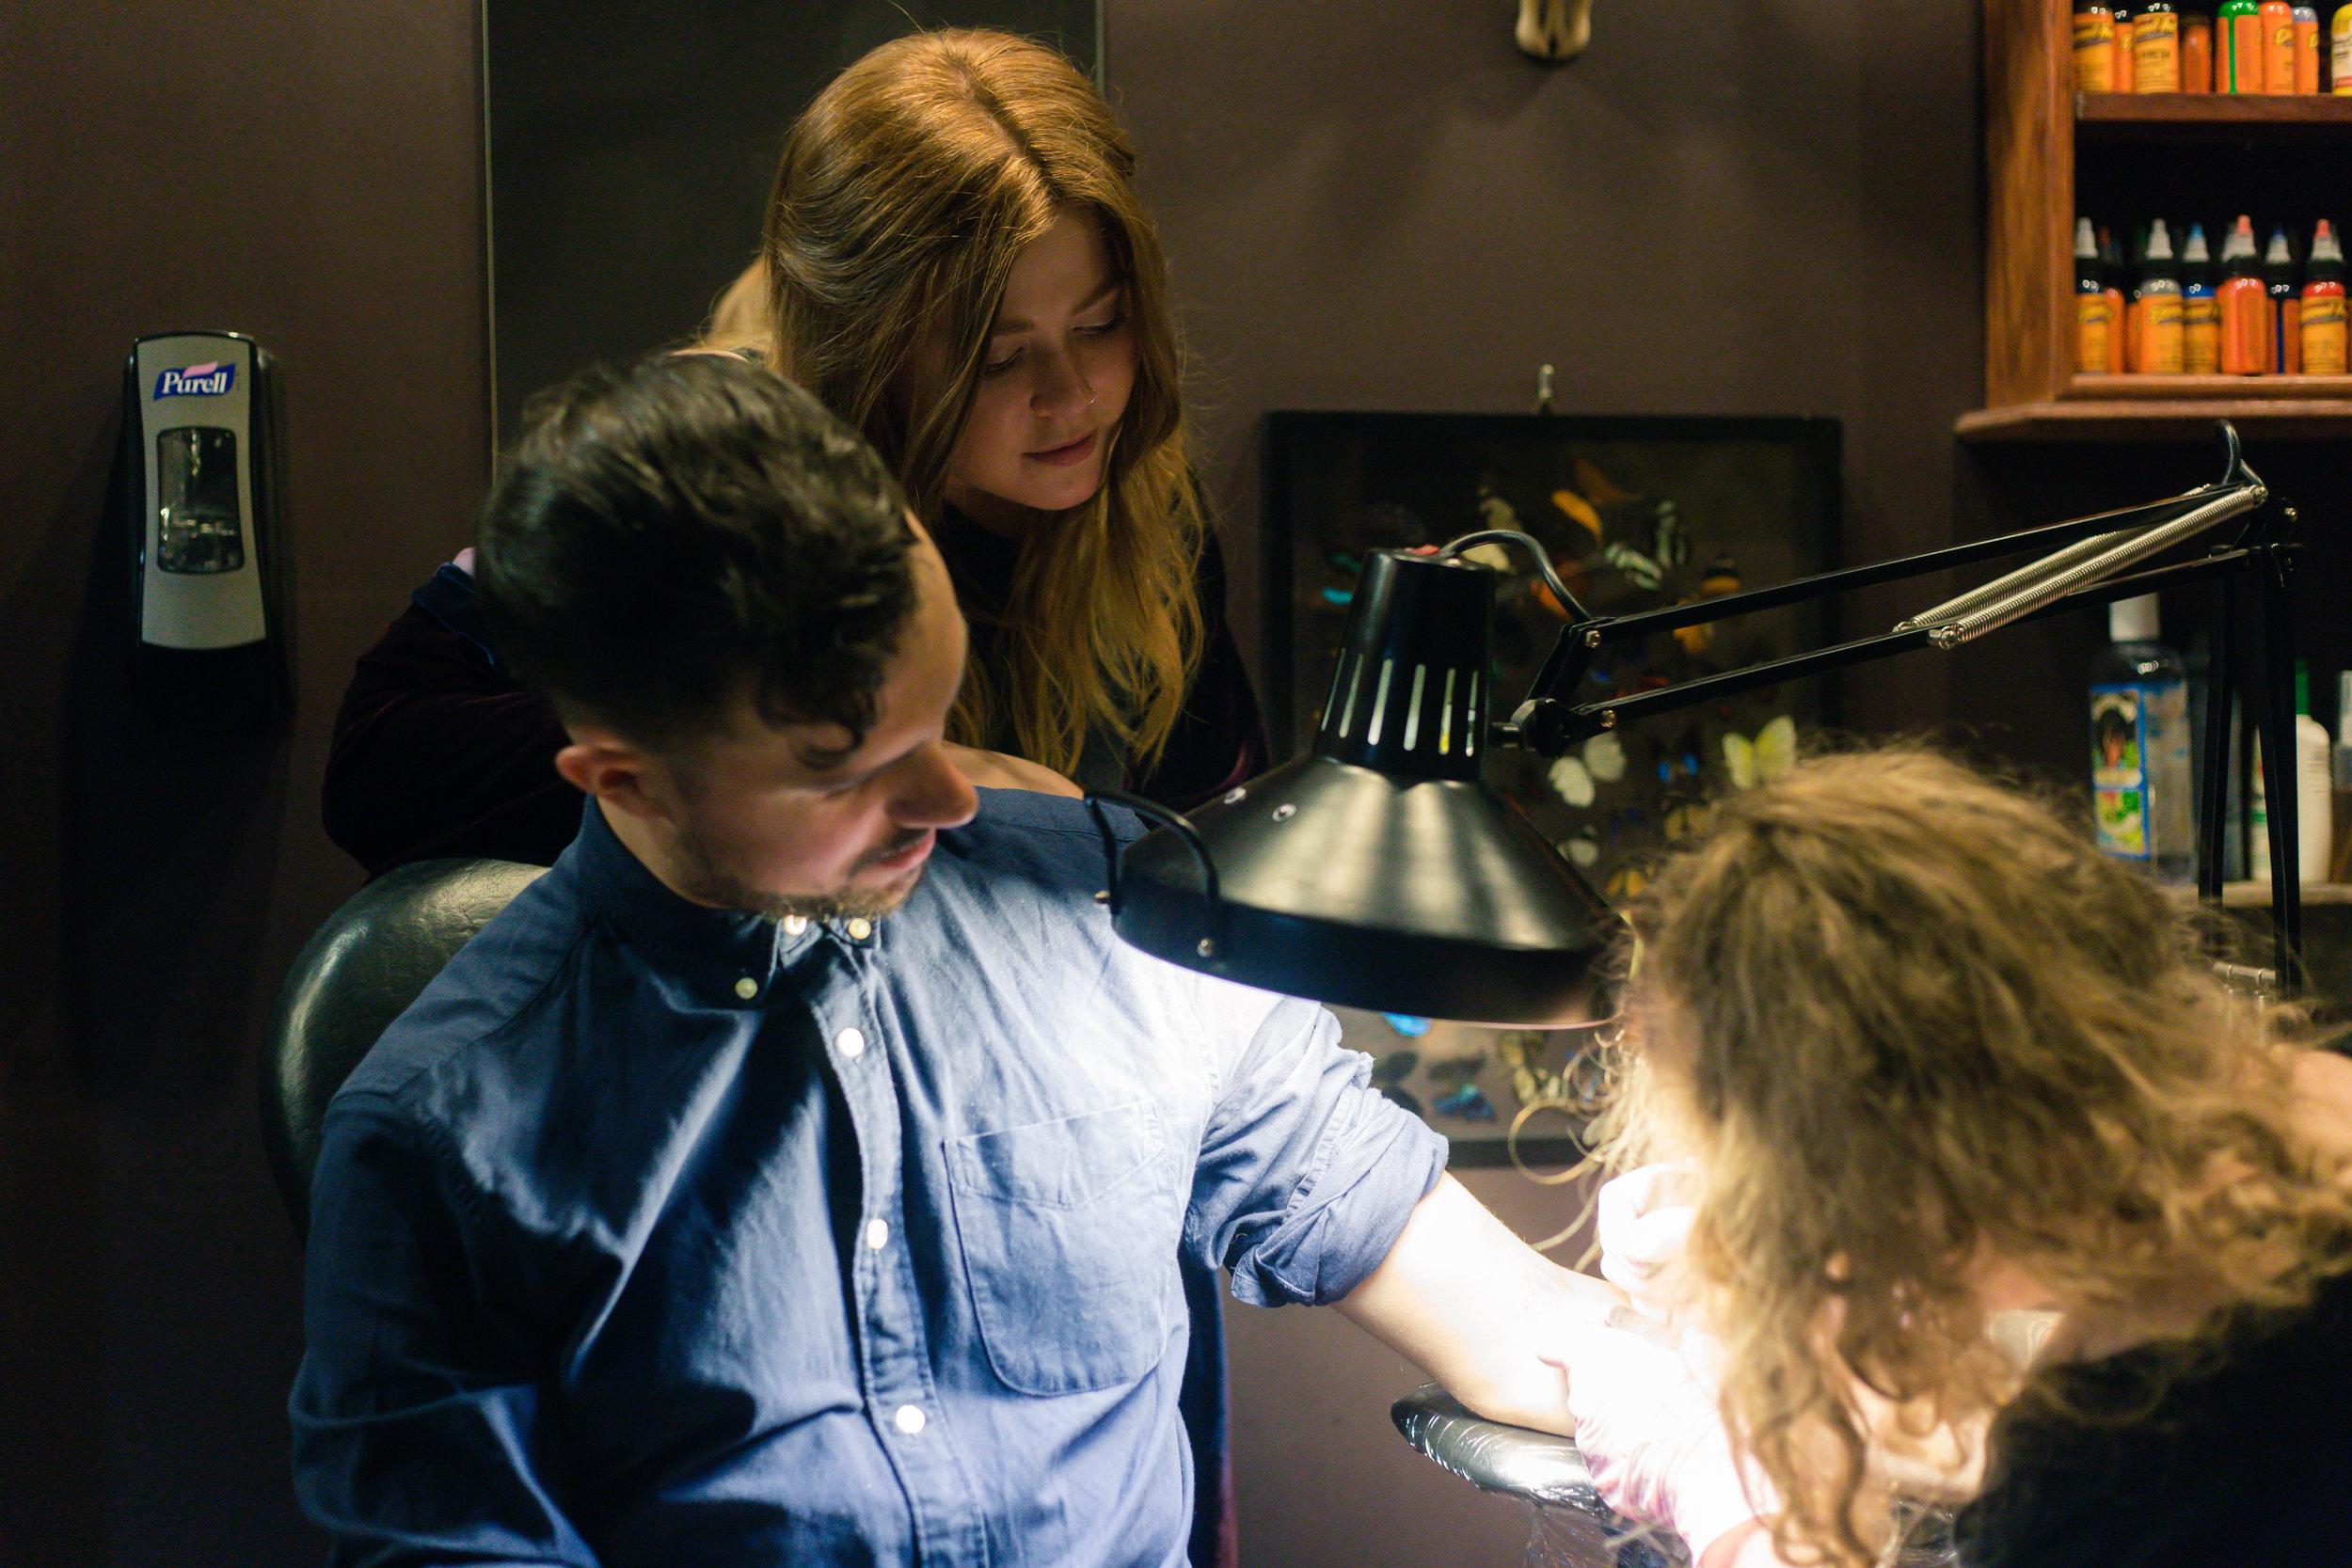 Kate-Alison-Photography-Gowanus-Brooklyn-Tattoo-Shop-Engagement-Session